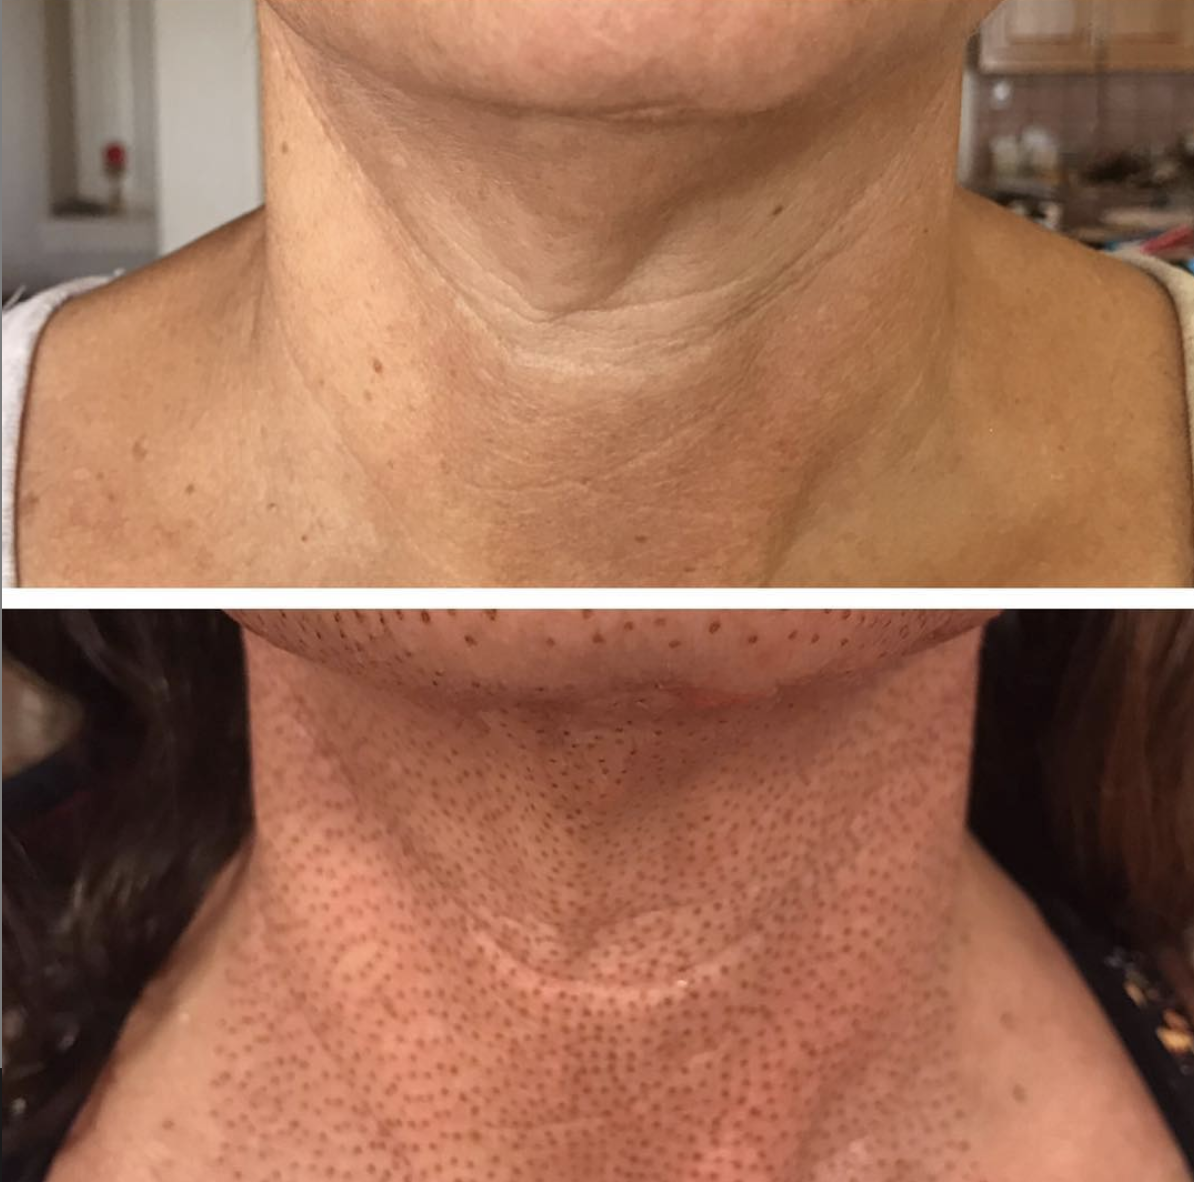 Neck lift, immediately post treatment. Immediate tightening of the skin.